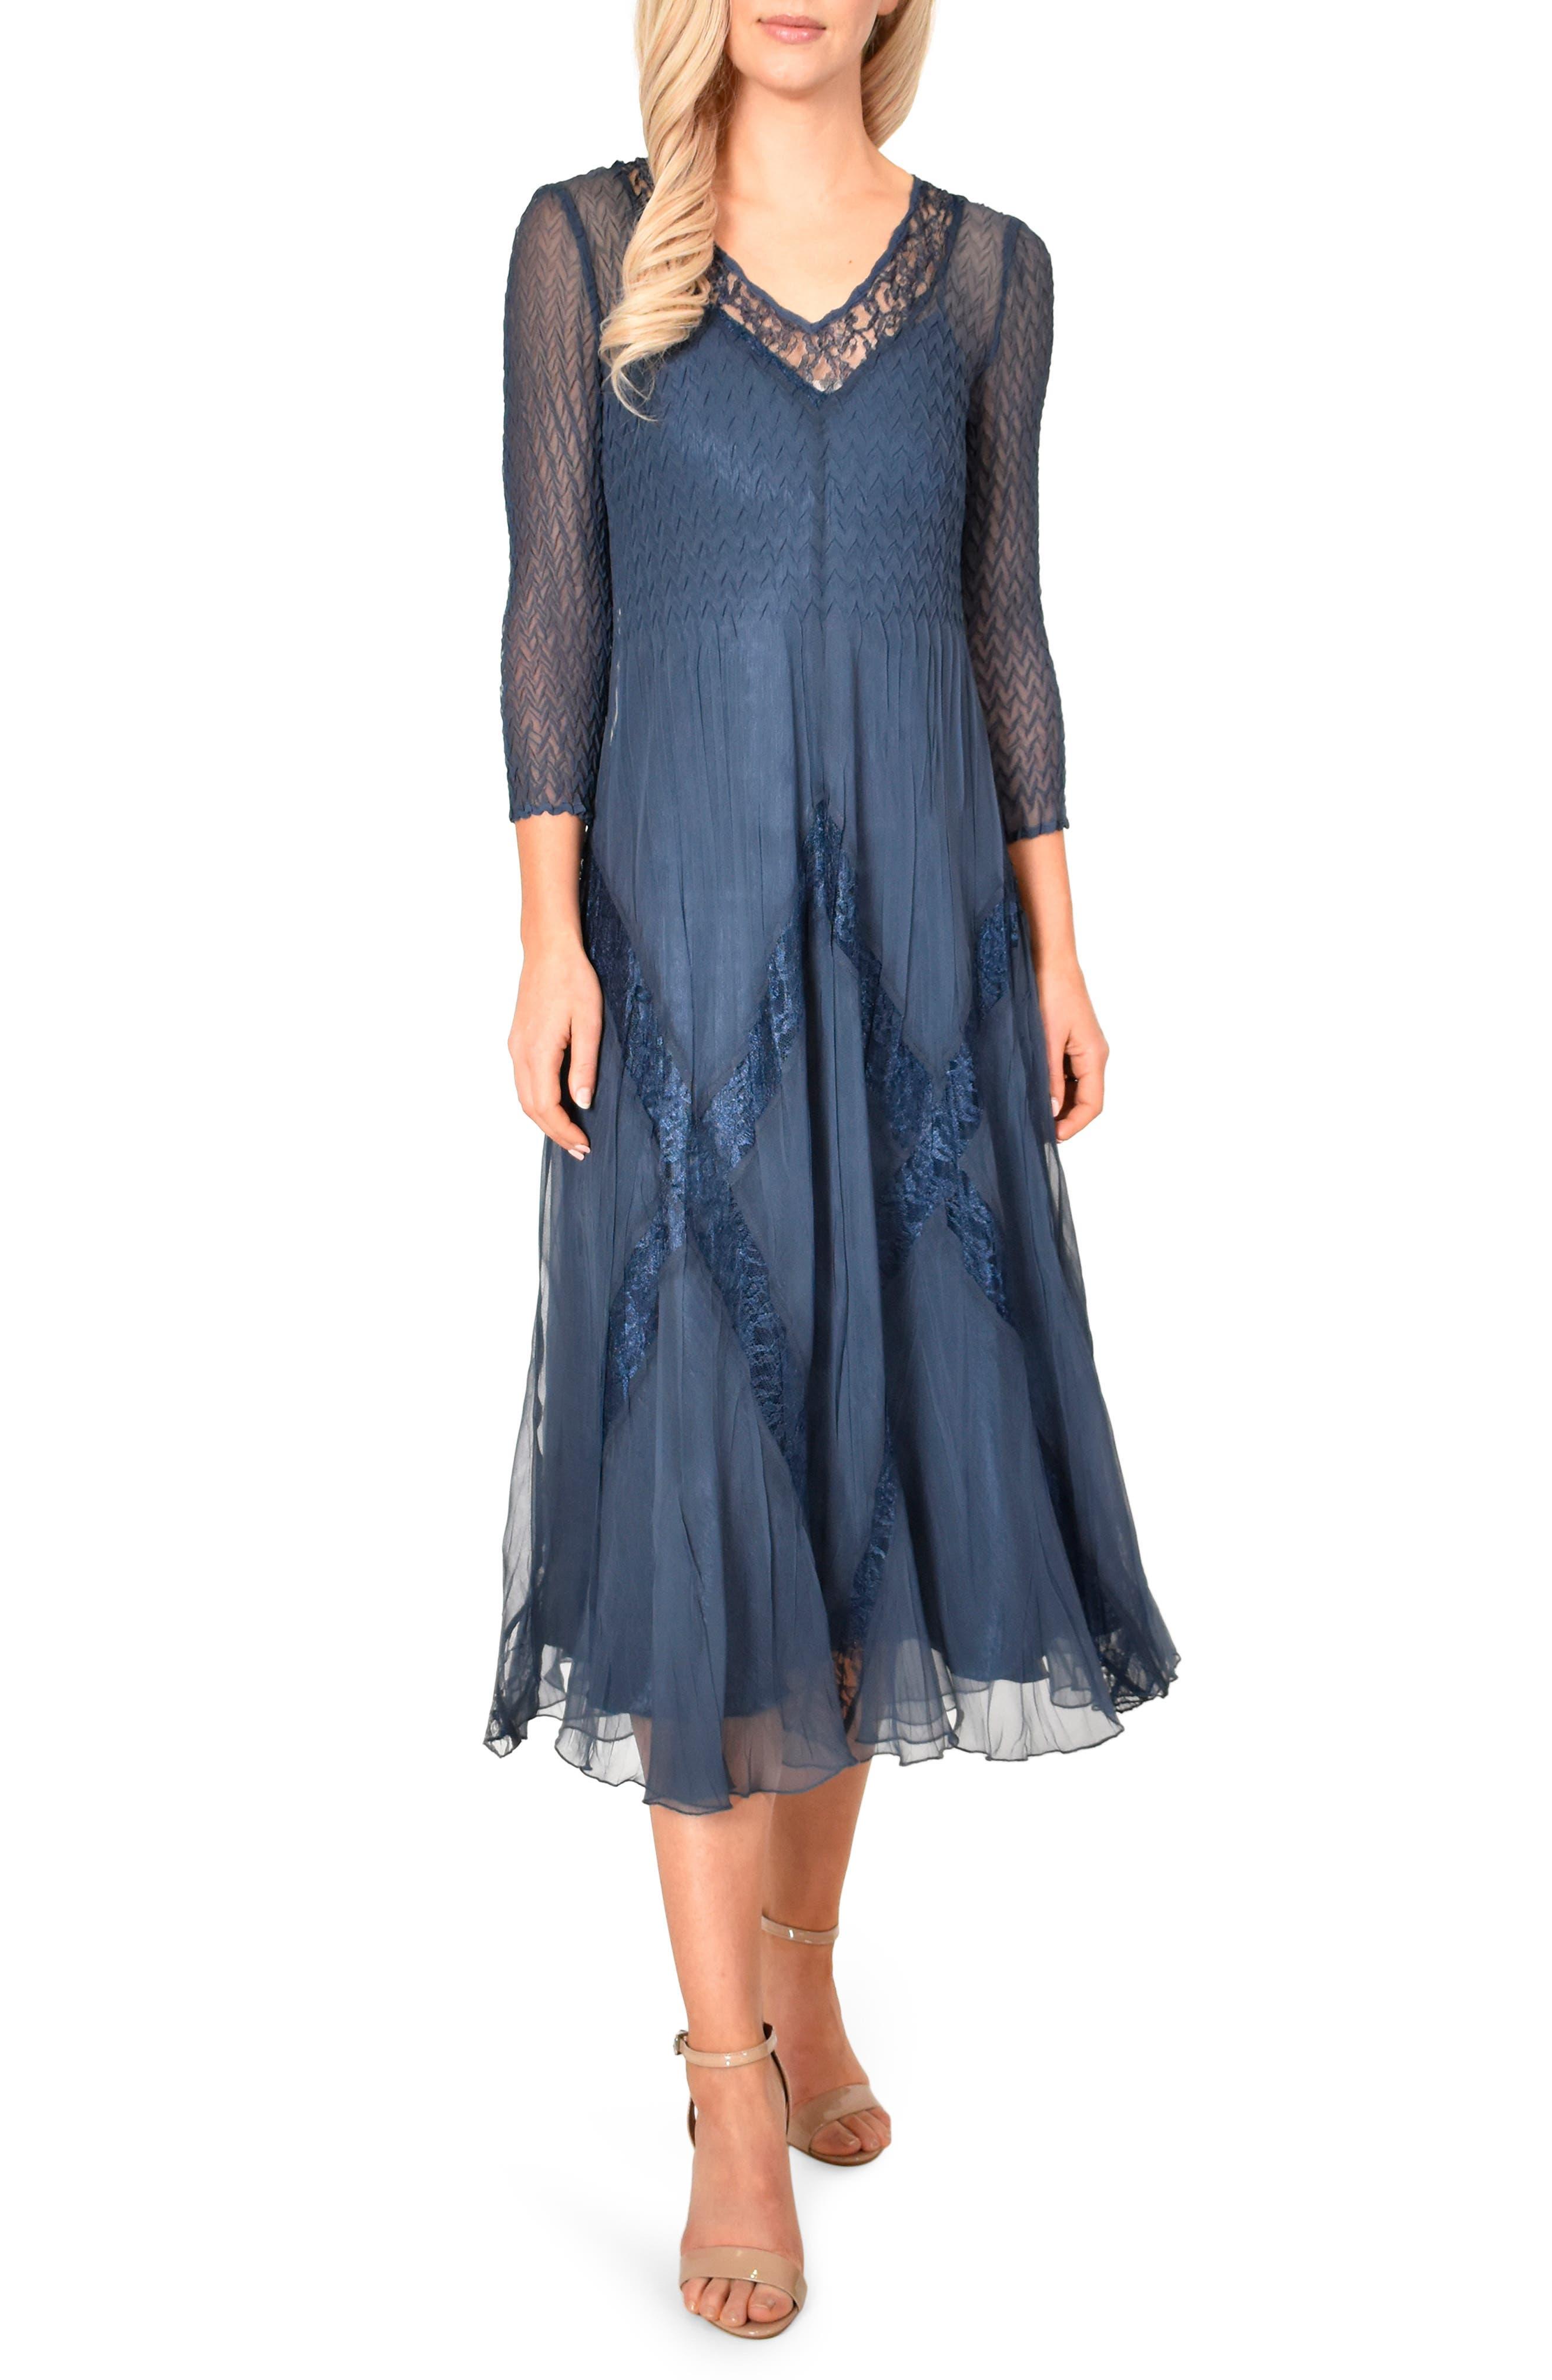 KOMAROV Beaded Chiffon A-Line Dress, Main, color, 400